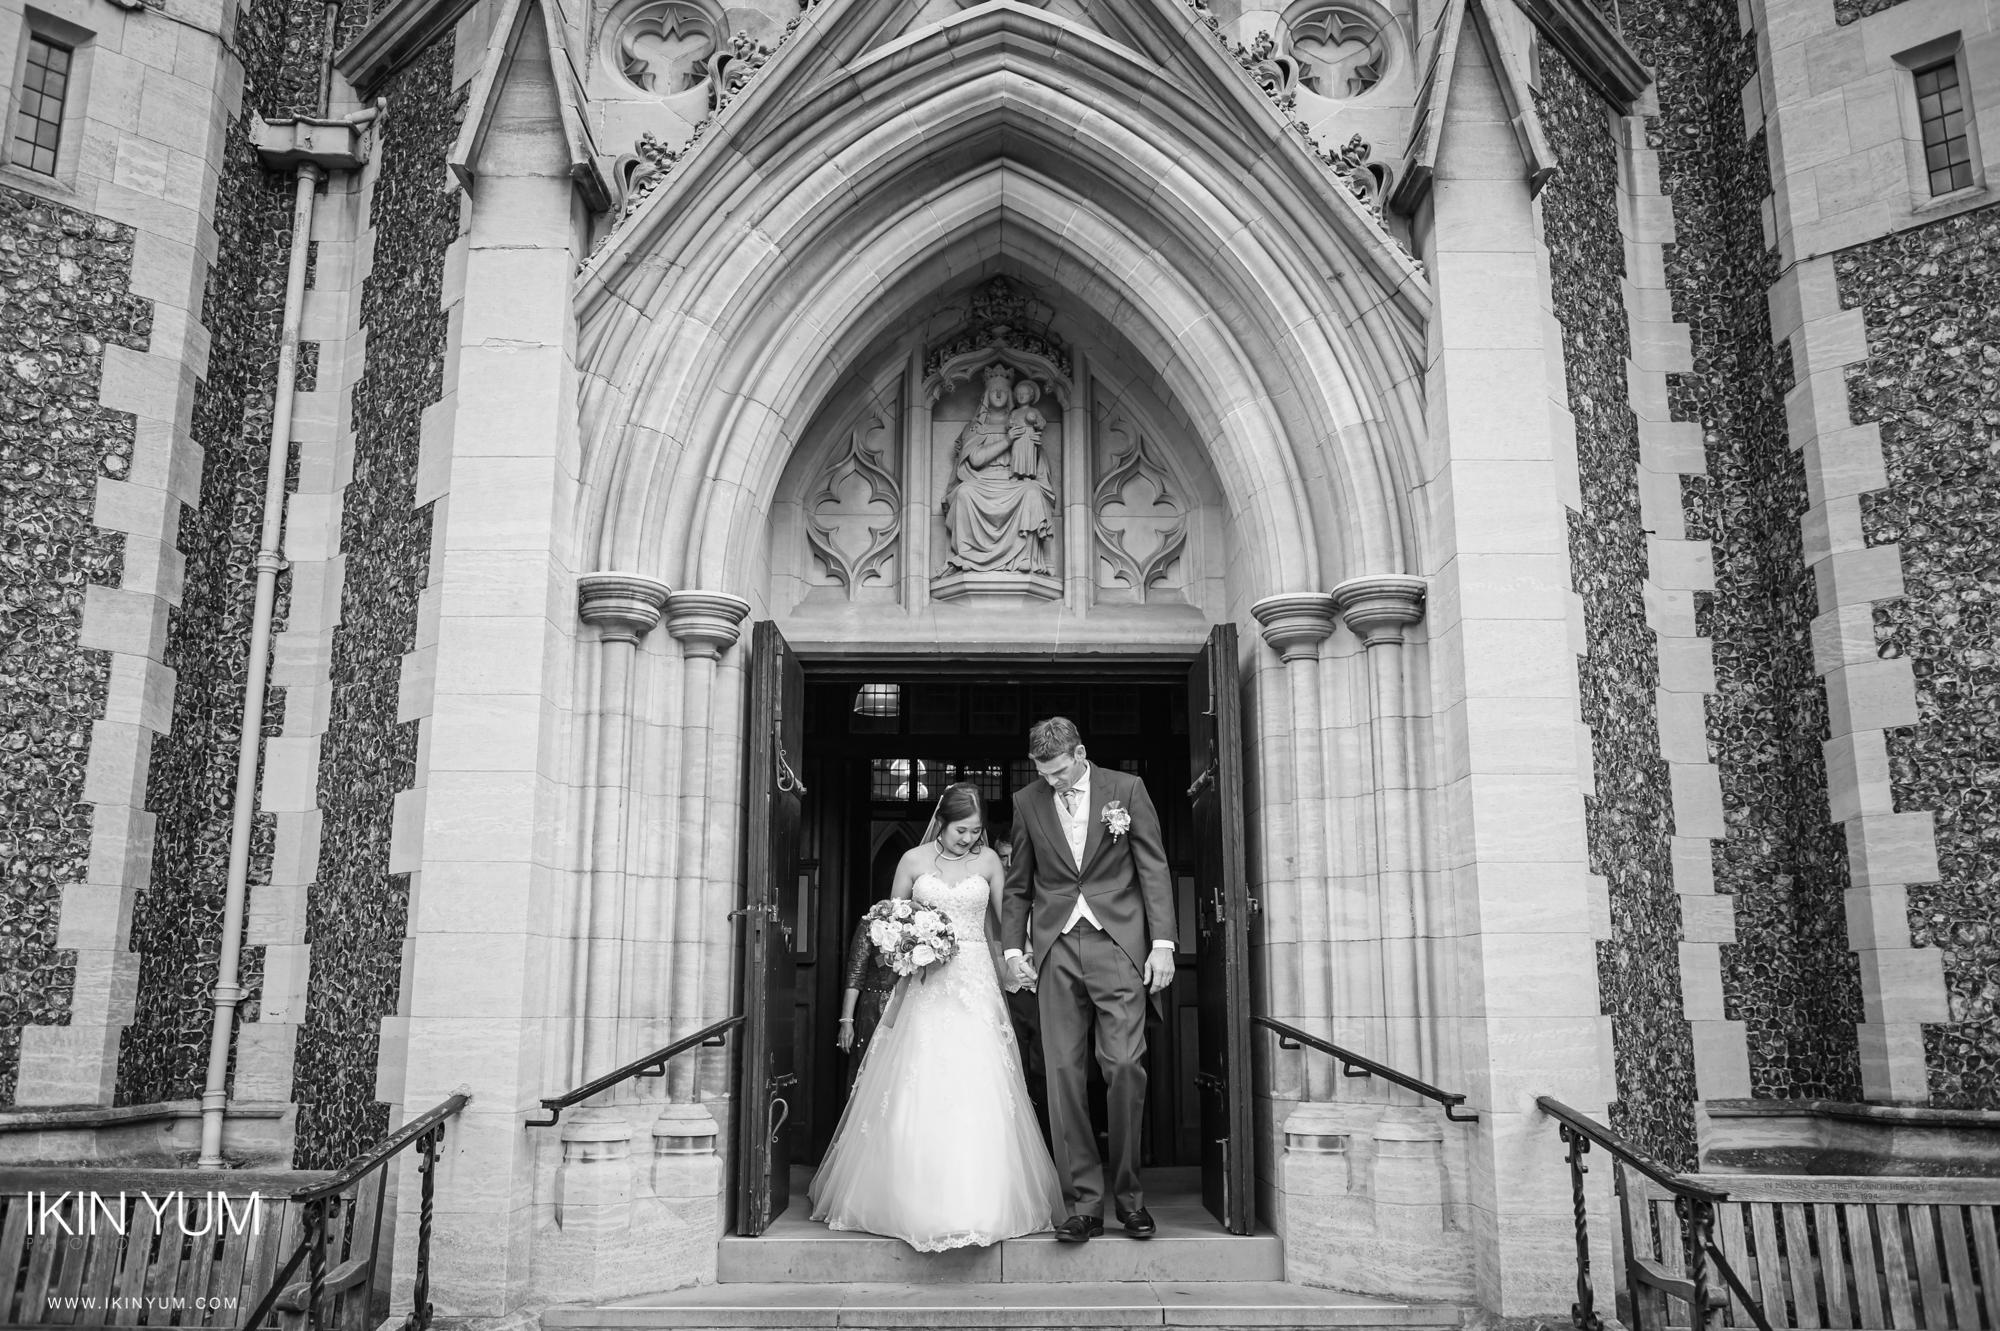 Teresa & Johnathan Weddong Day - After Ceremony-0004.jpg